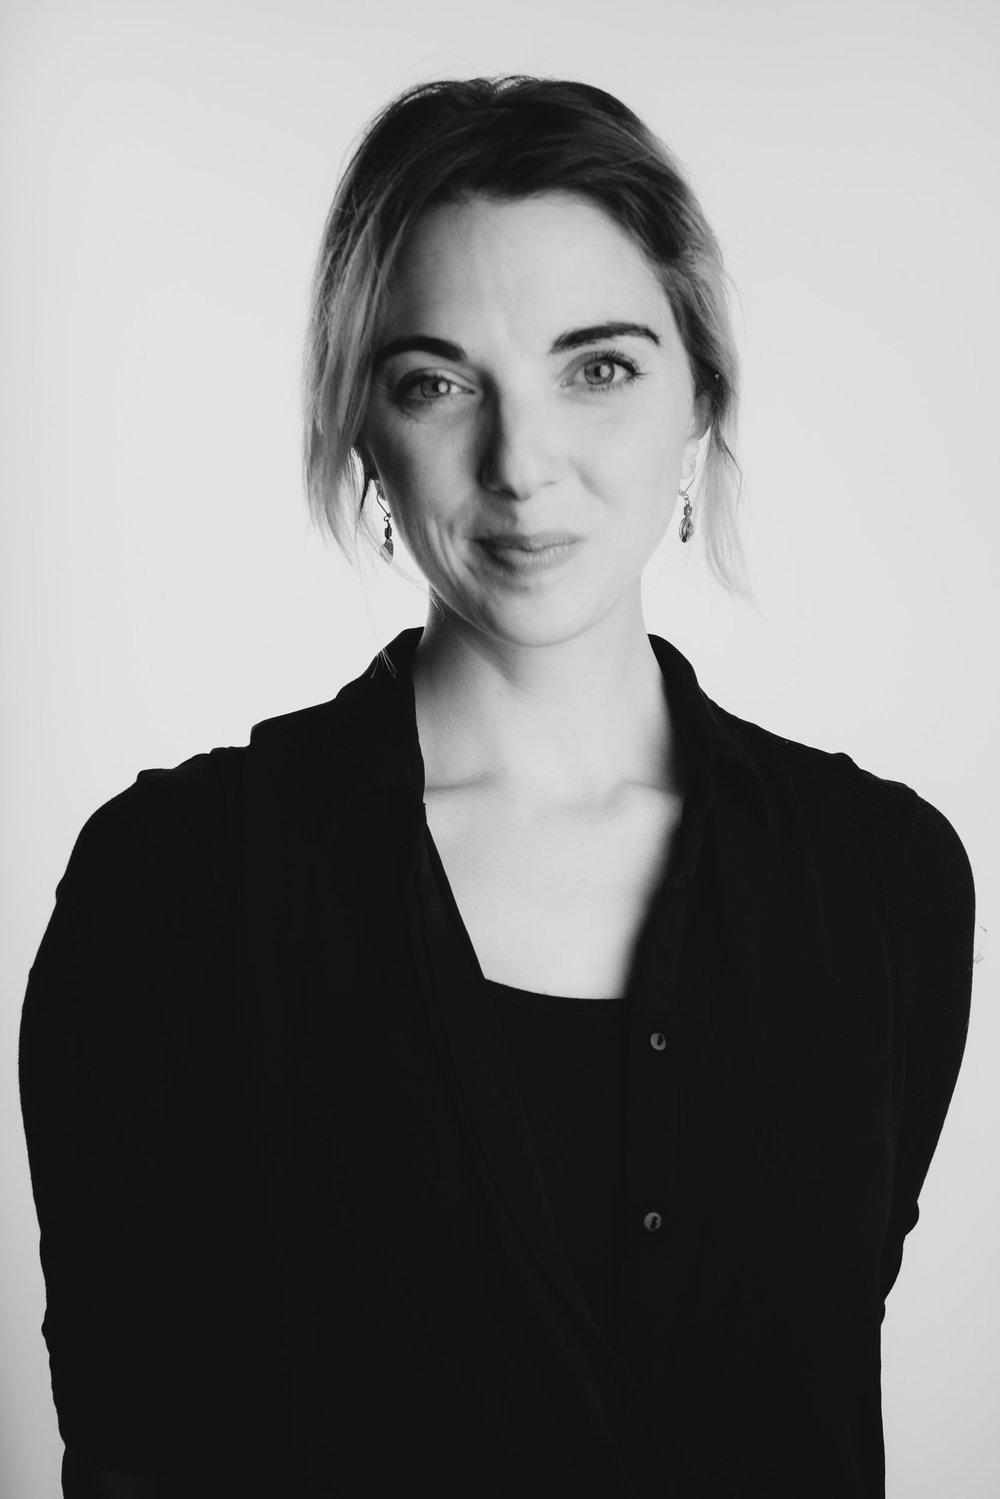 Joëlle Pouliot